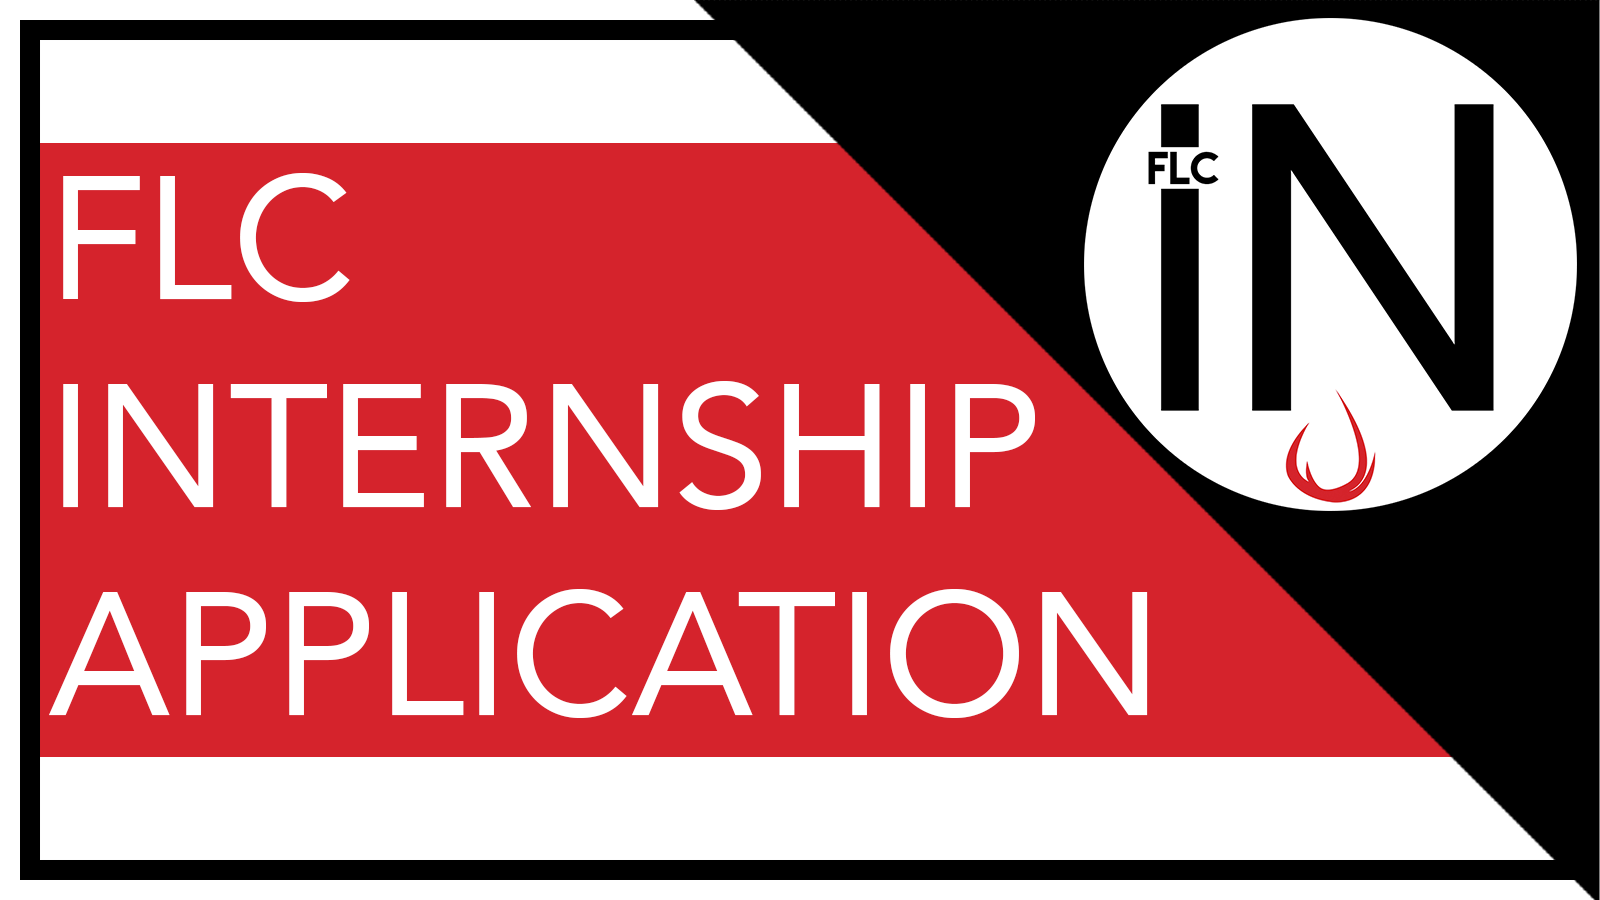 FLC Internship (sign Up) (1600x900)